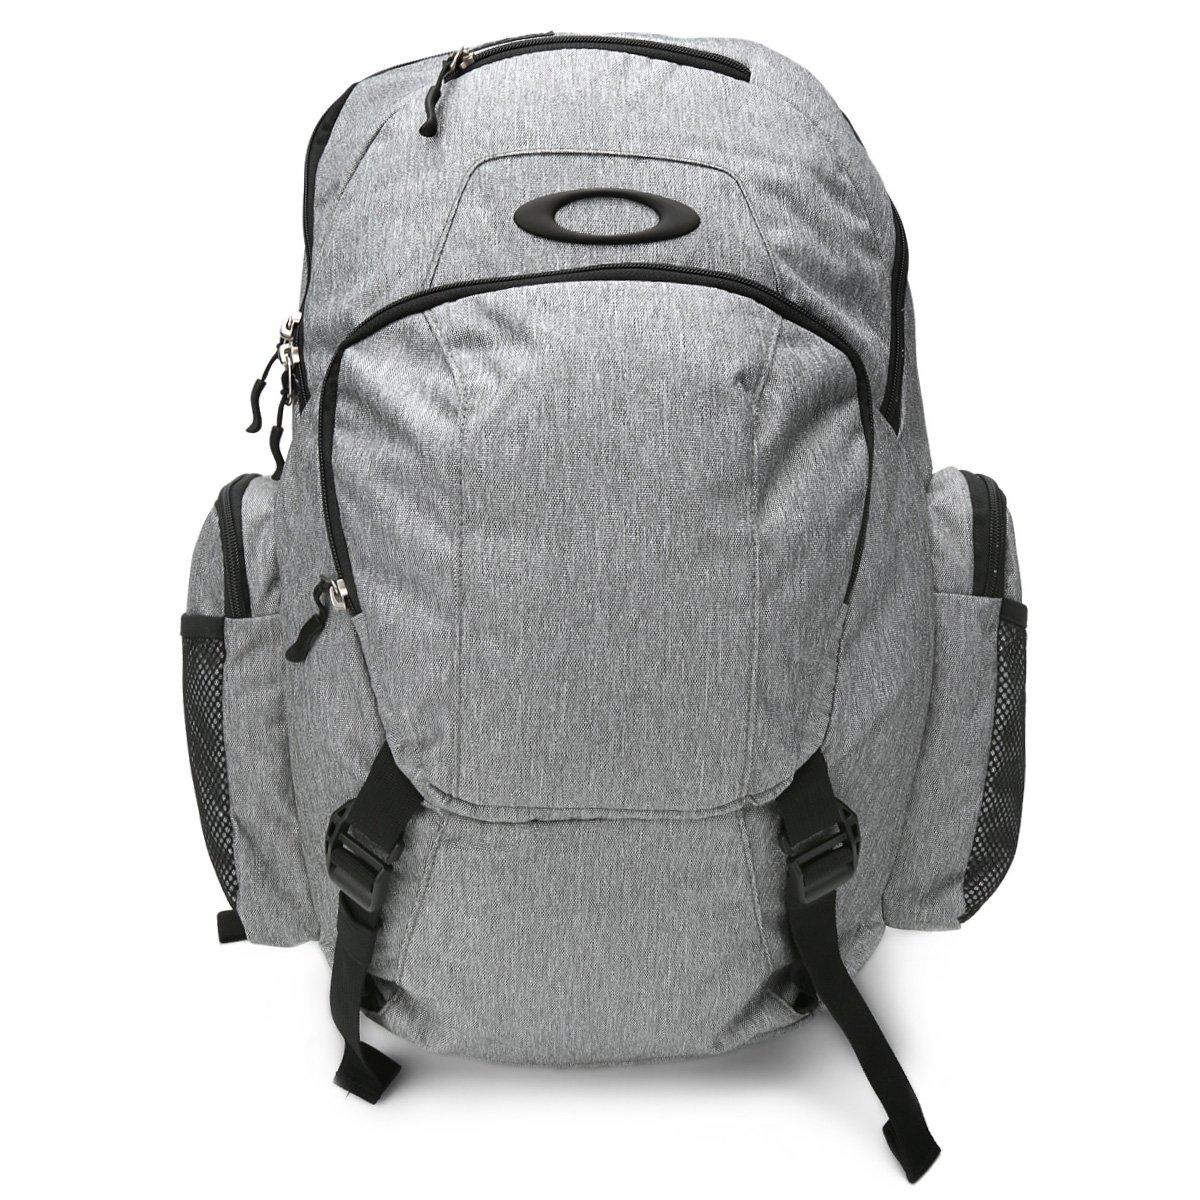 Mochila Oakley Mod Blade Wet Dry 30L Masculina - Cinza - Compre Agora  30ece1c110a